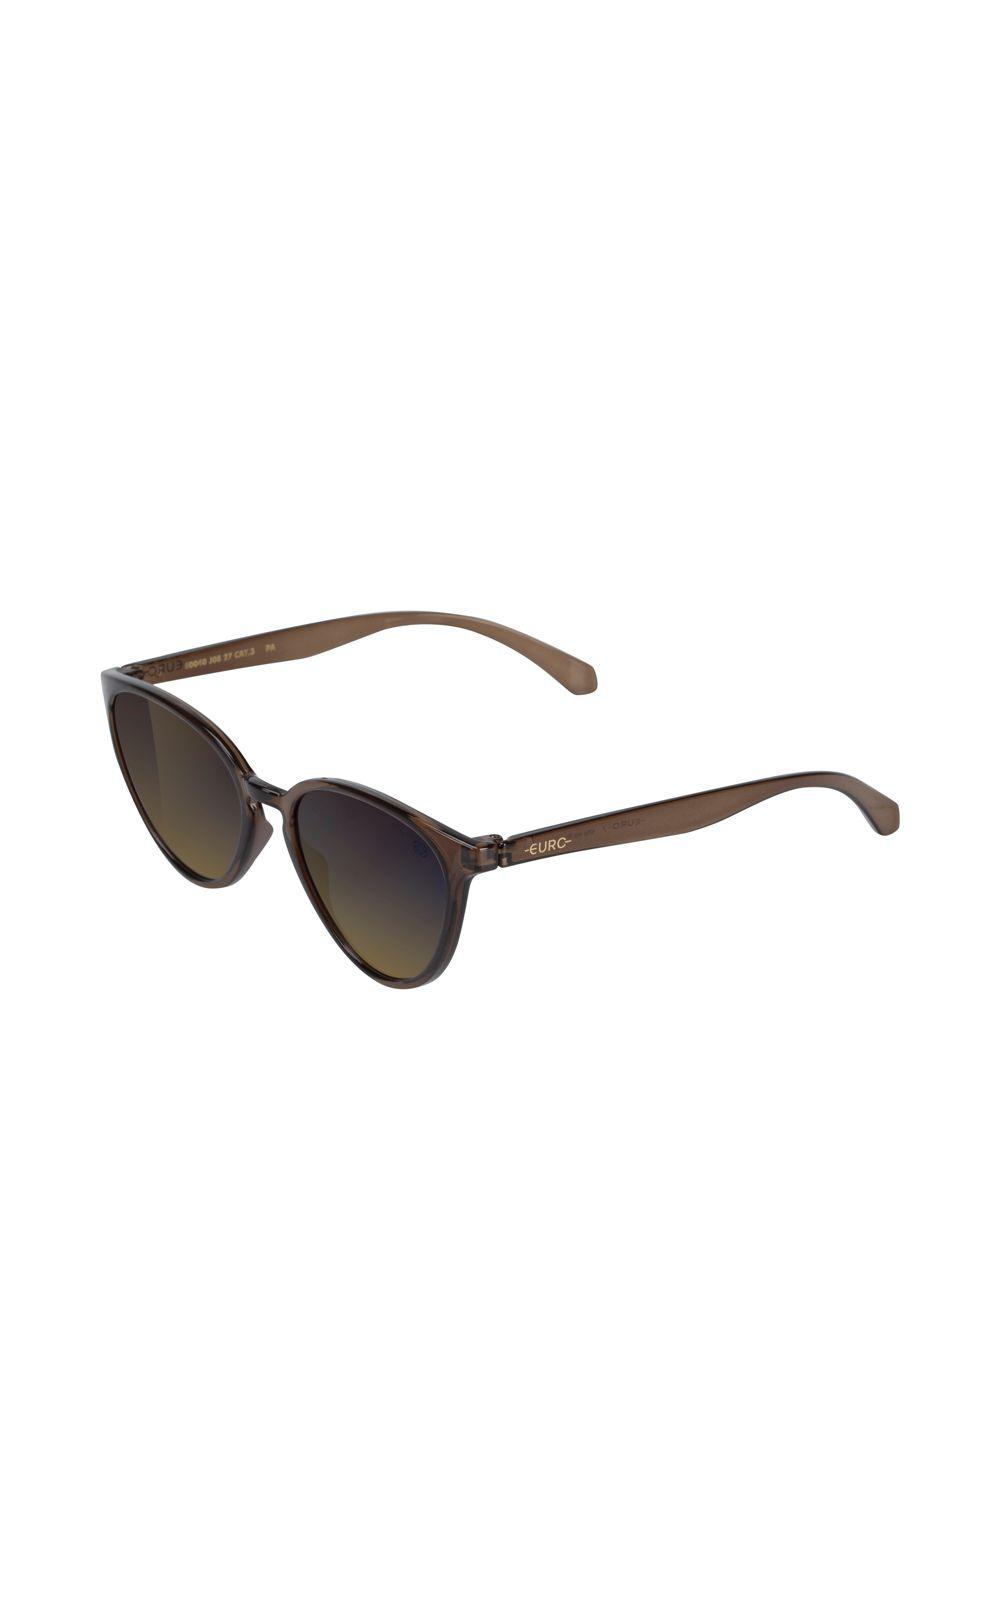 Foto 2 - Óculos Euro Geometric Trendy Marrom E0040J0827/8M